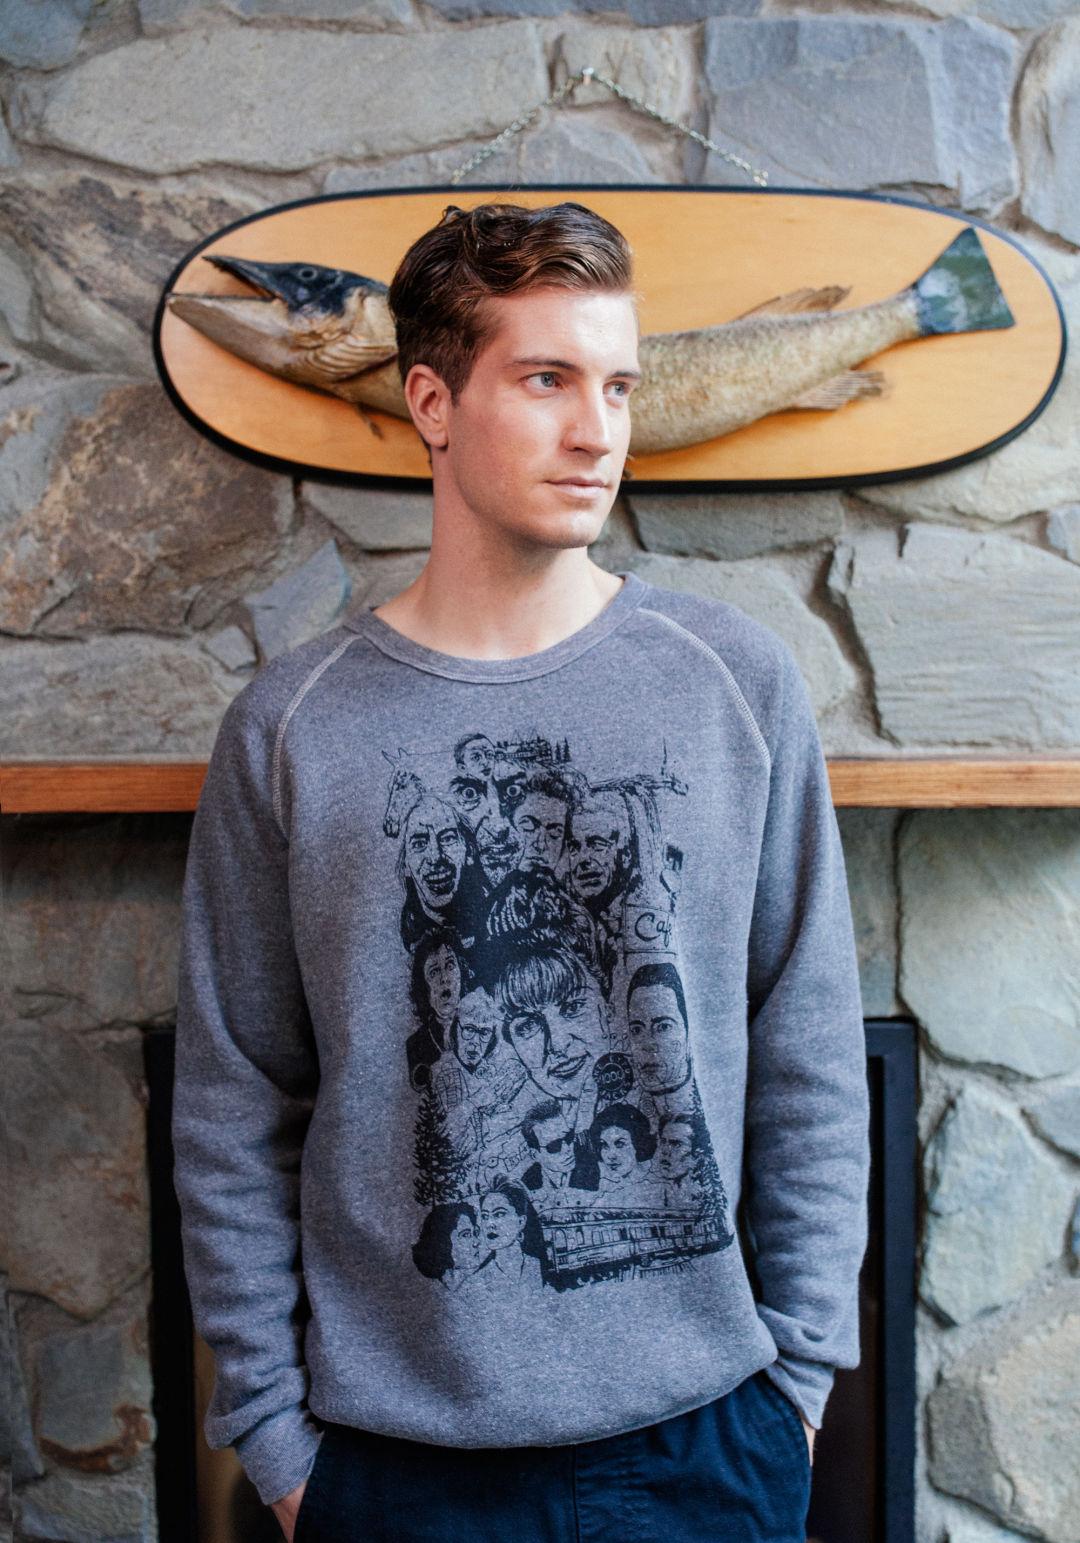 Sm sweatshirt img 6967 flat gutktl